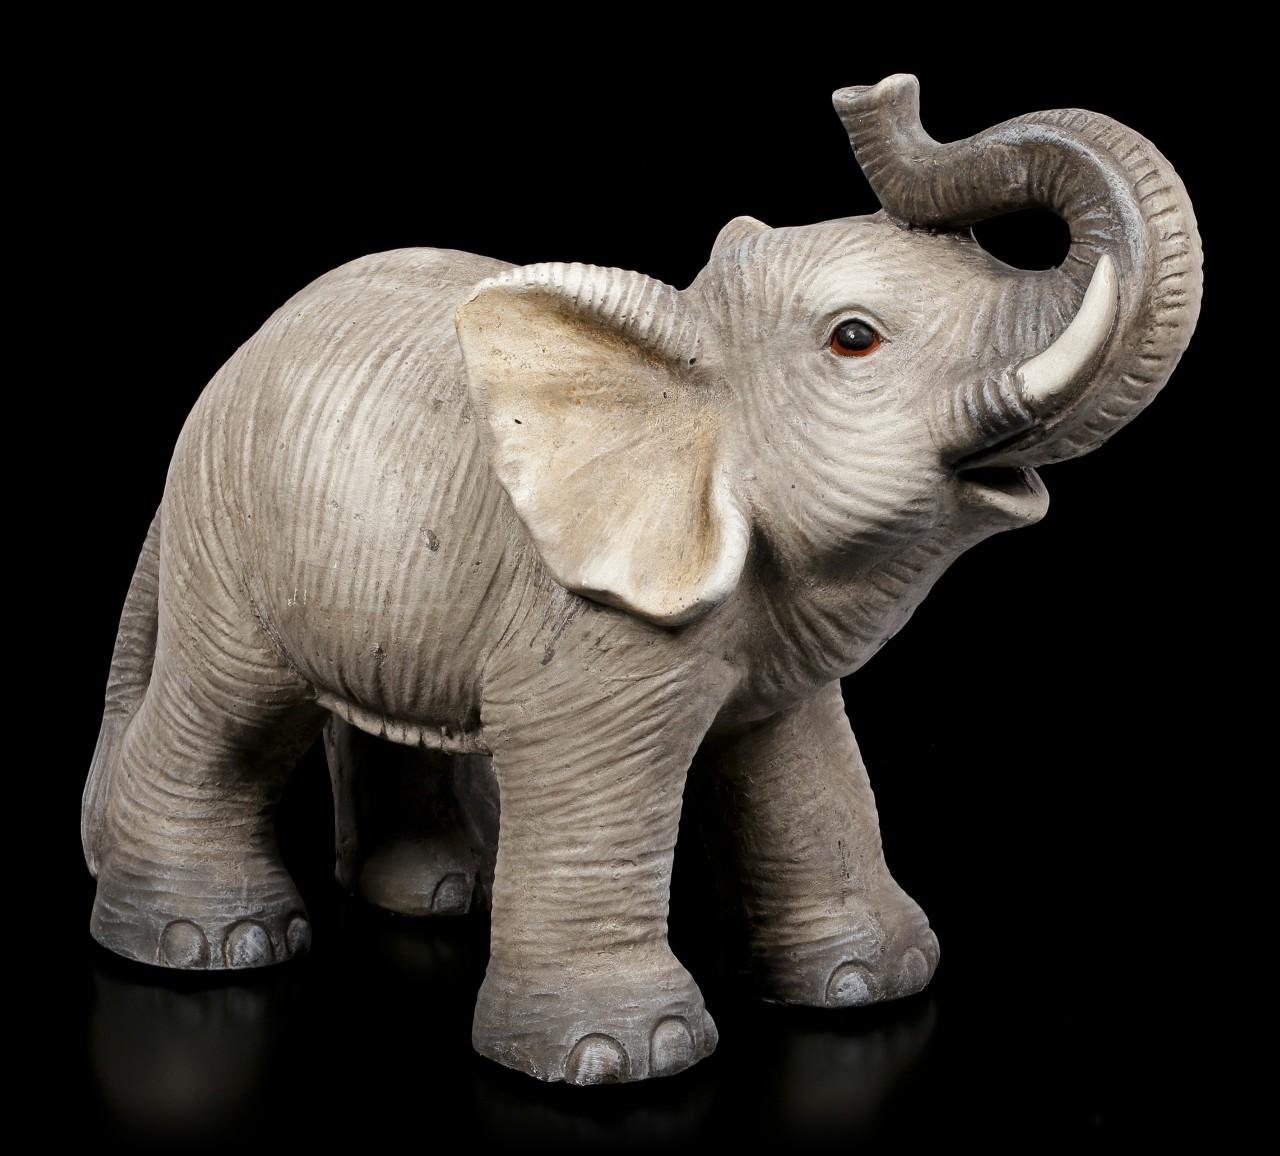 Gartenfigur - Elefant mit erhobenem Rüssel